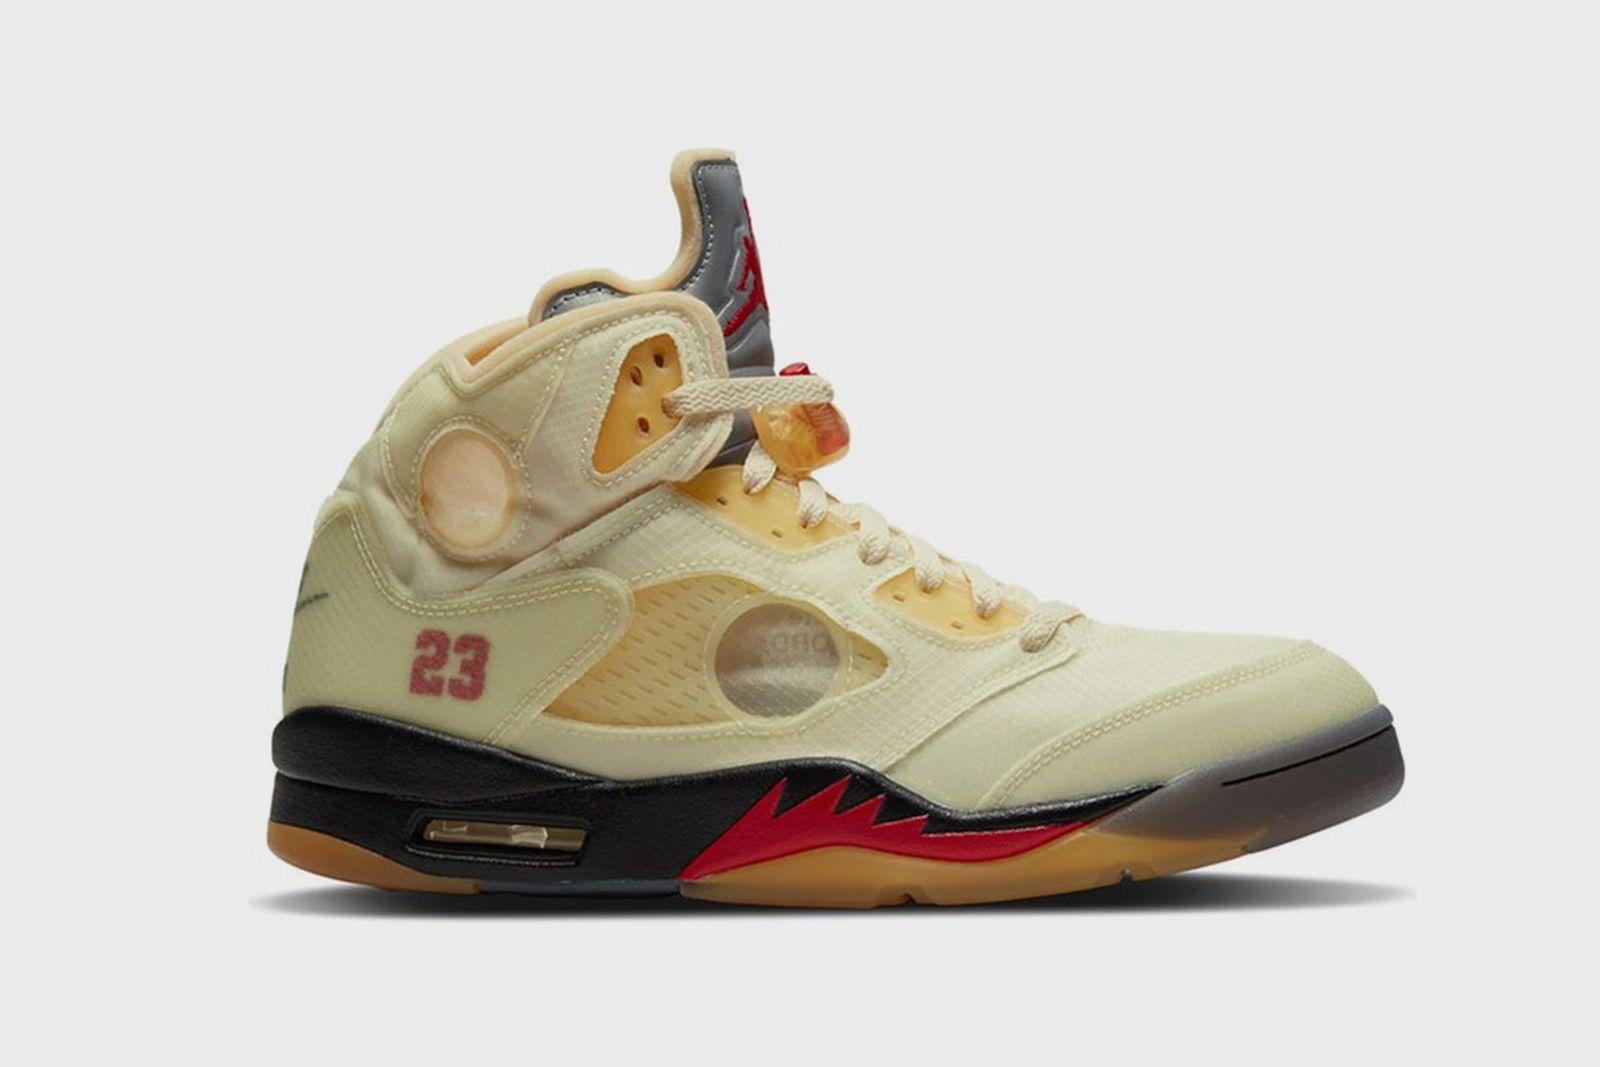 Where to Buy the Off-White™ x Nike Air Jordan 5